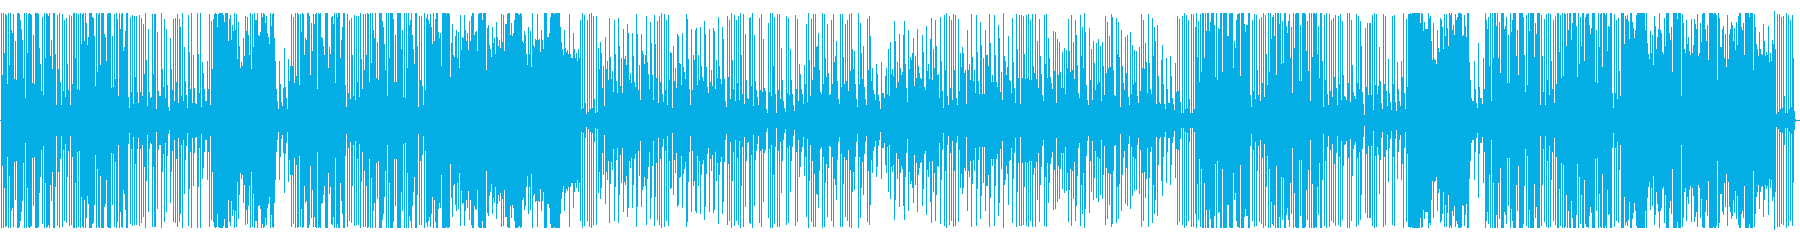 YouTube トロンボーン・軽快の再生済みの波形